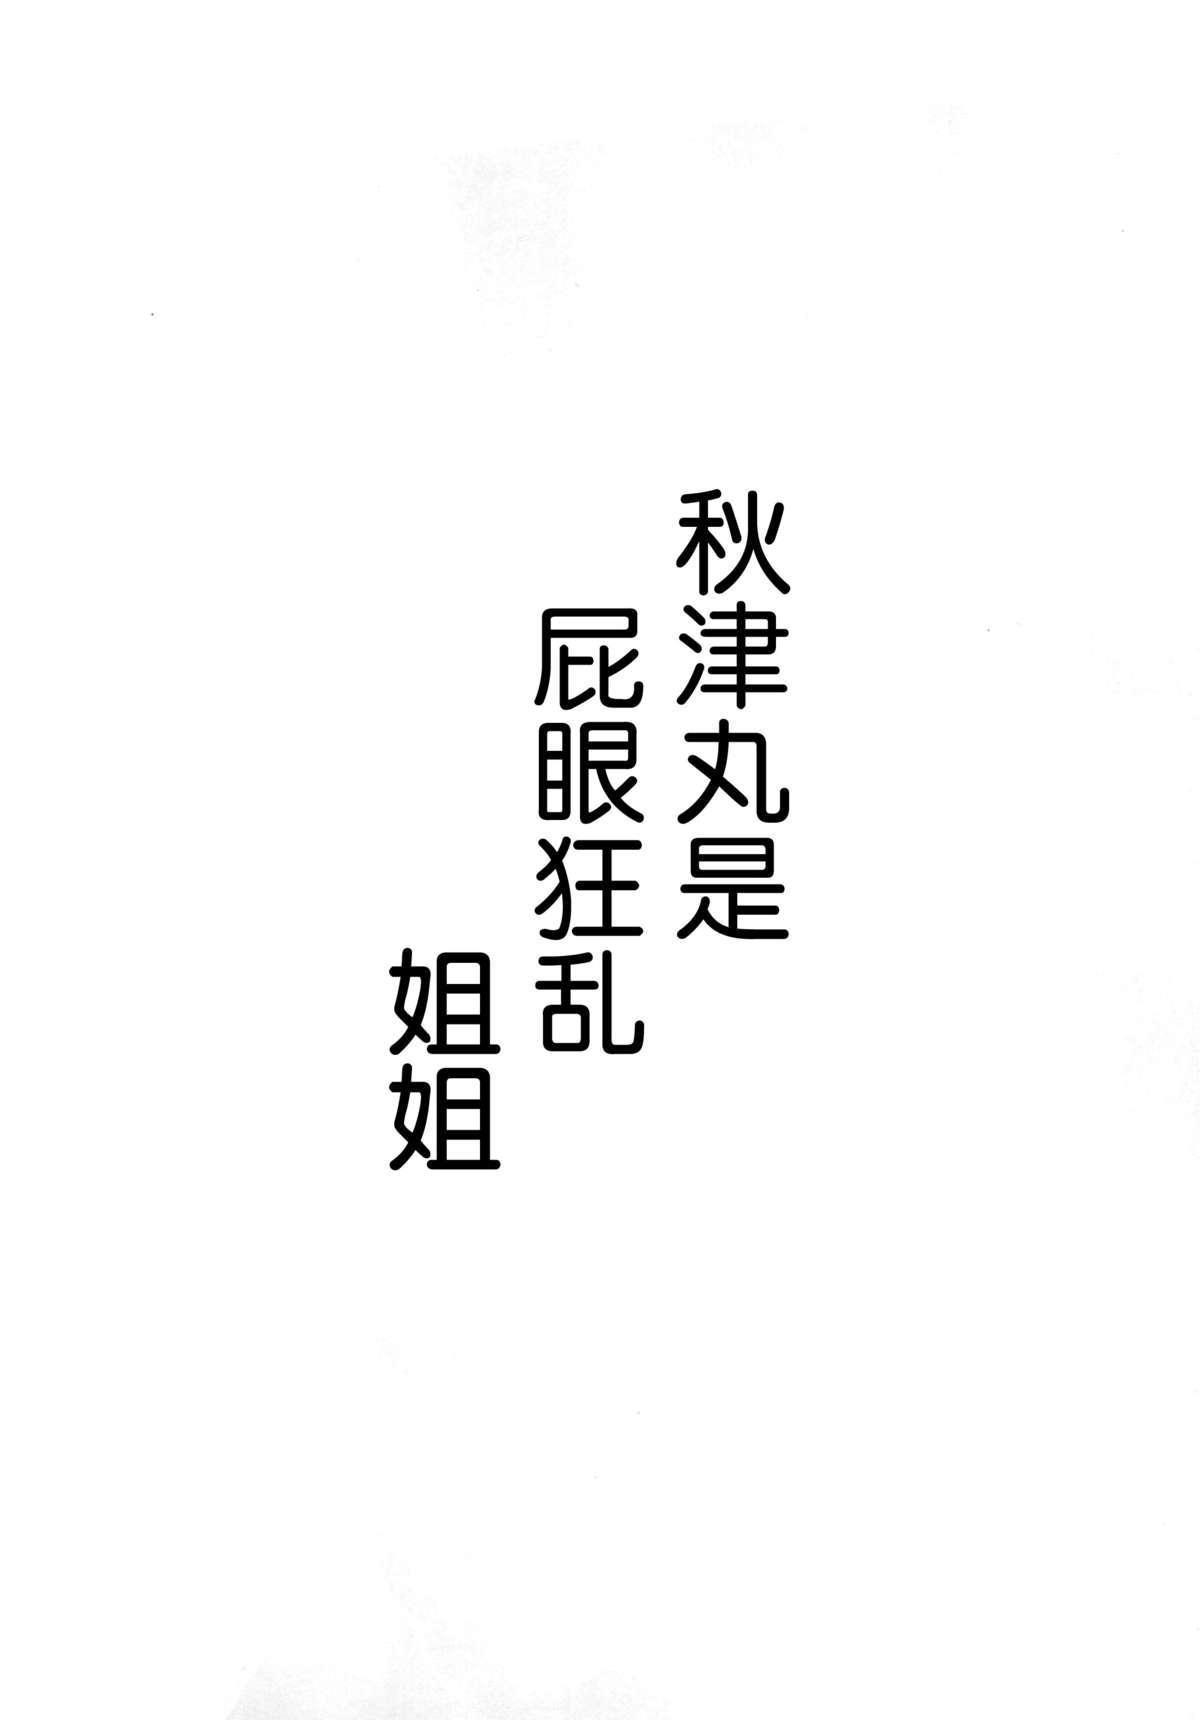 Akitsu Maru wa Ketsuana Gurui Onee-chan   秋津丸是屁眼狂乱姐姐 4